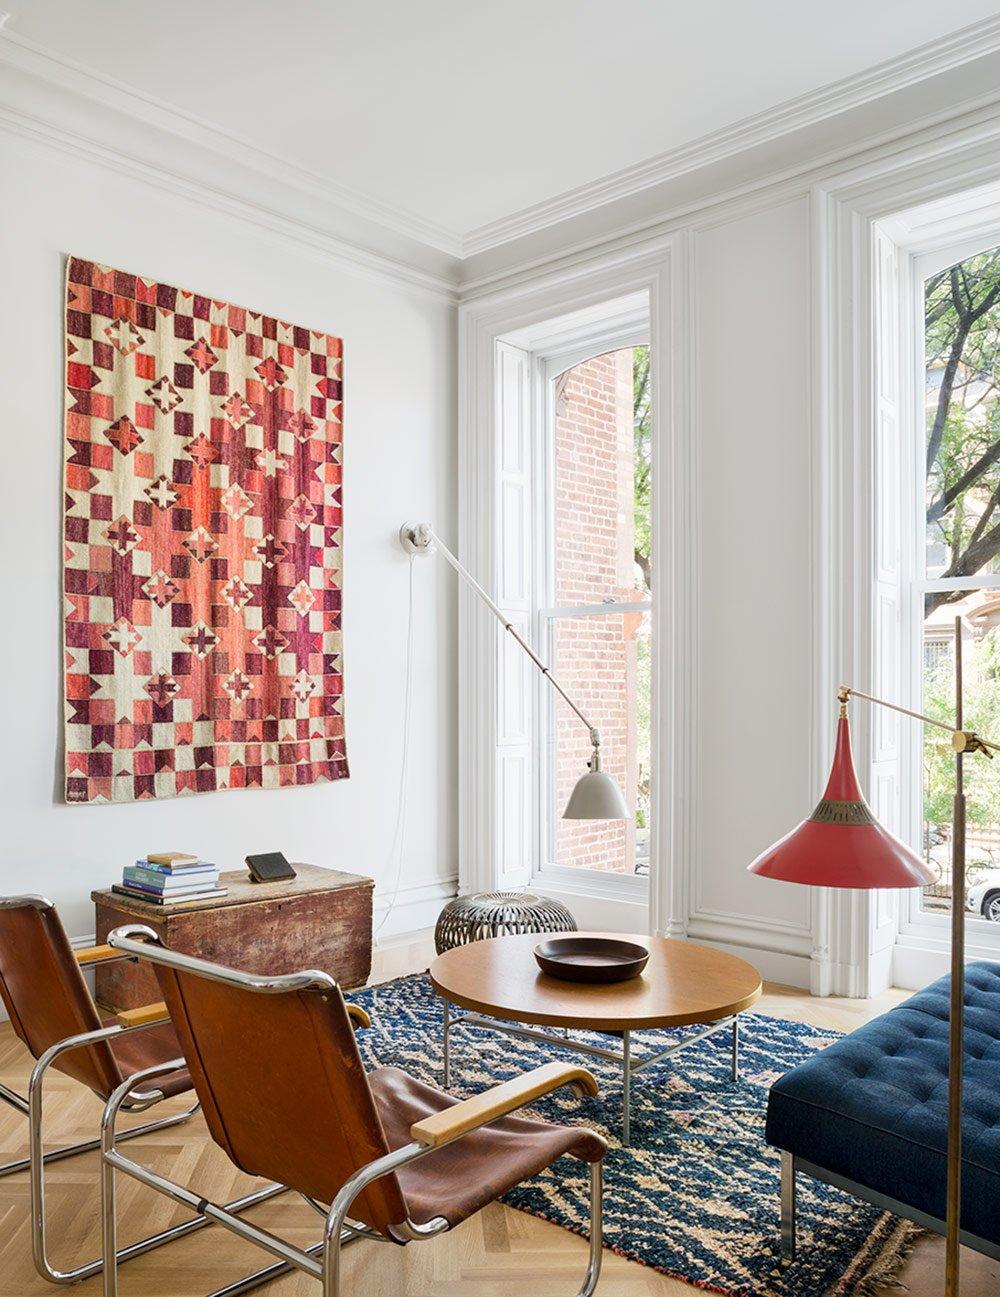 brownstone-renovation-prospect-park-brooklyn-4